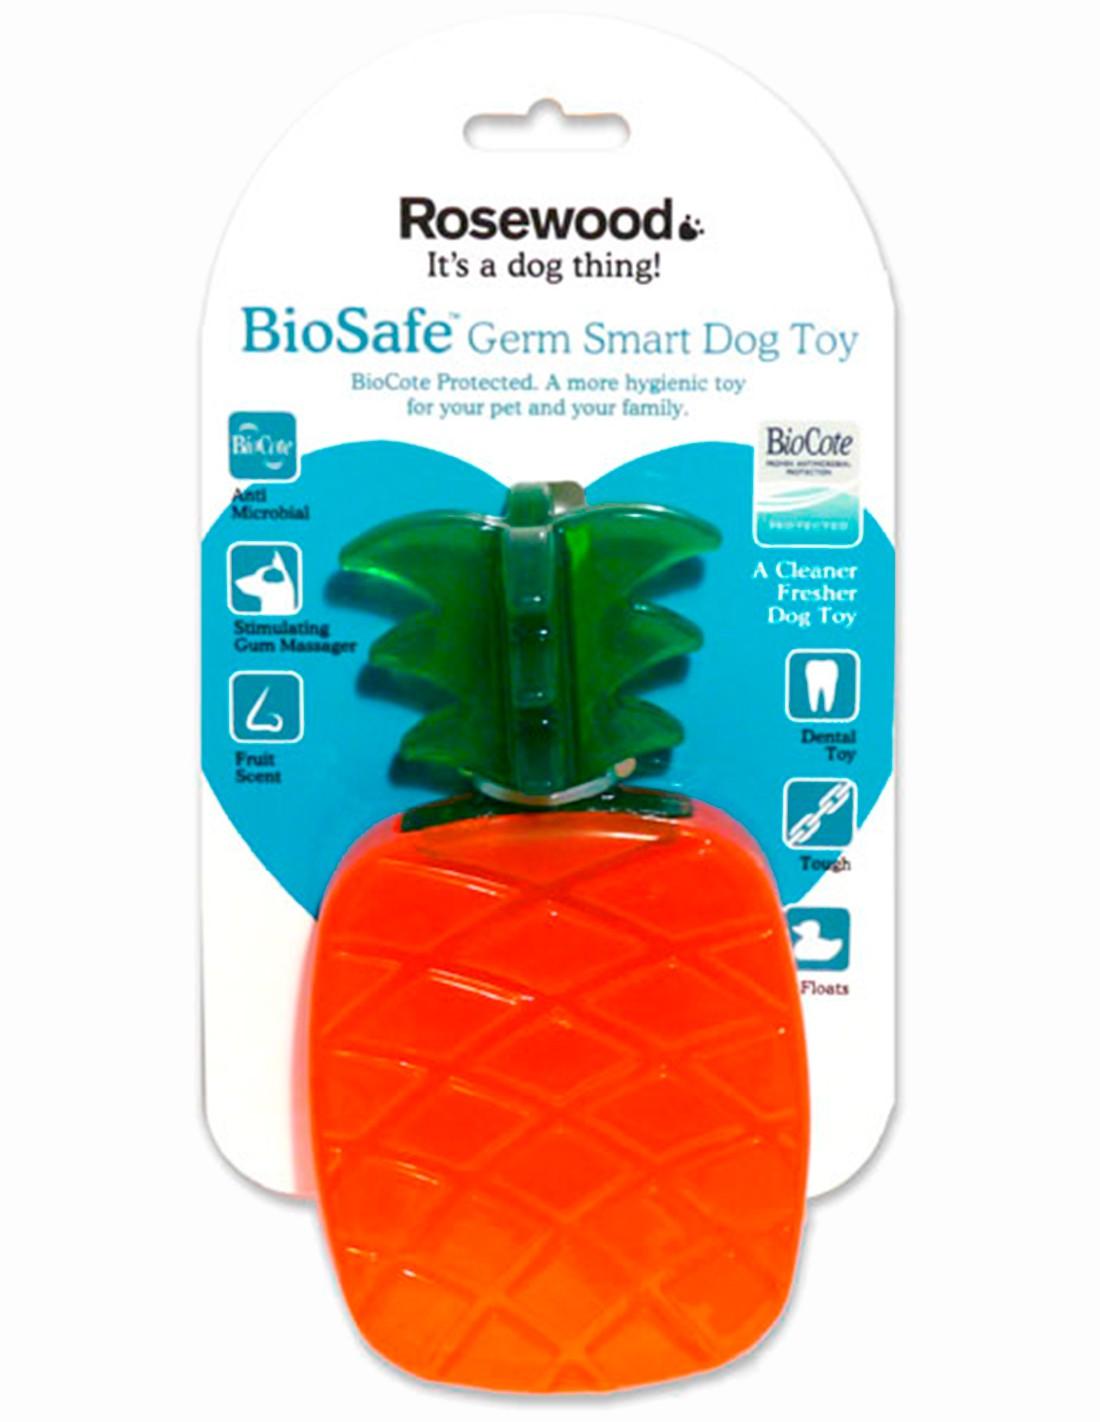 Biosafe Pineapple Juguete de goma con olor a Piña